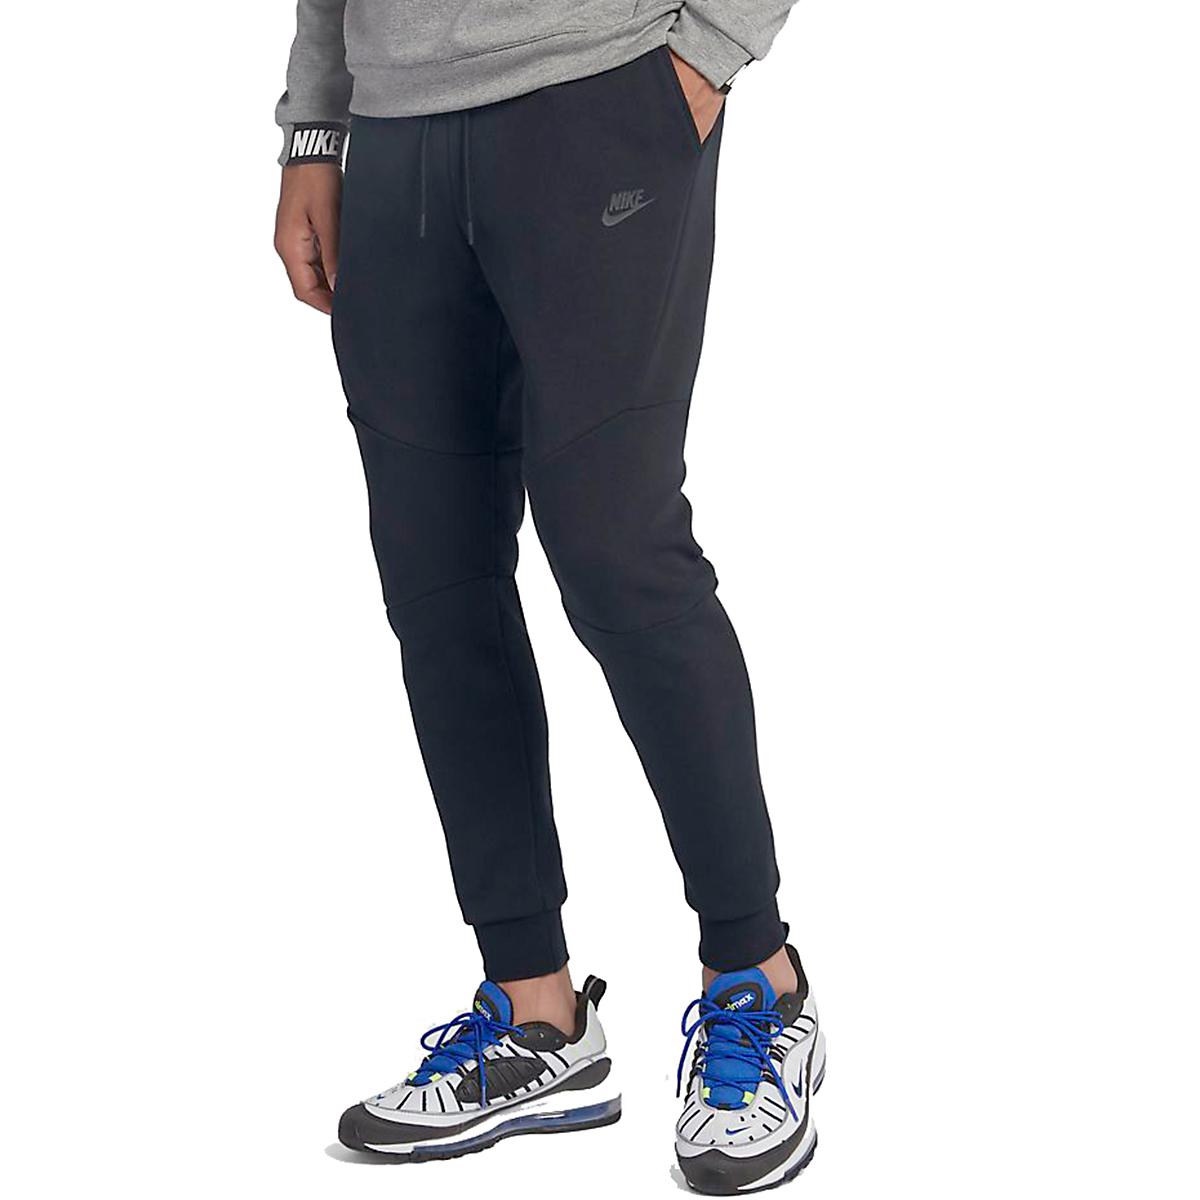 Men's Nike Tech Fleece Jogger  - Color: Black - Size: S, Black, large, image 1